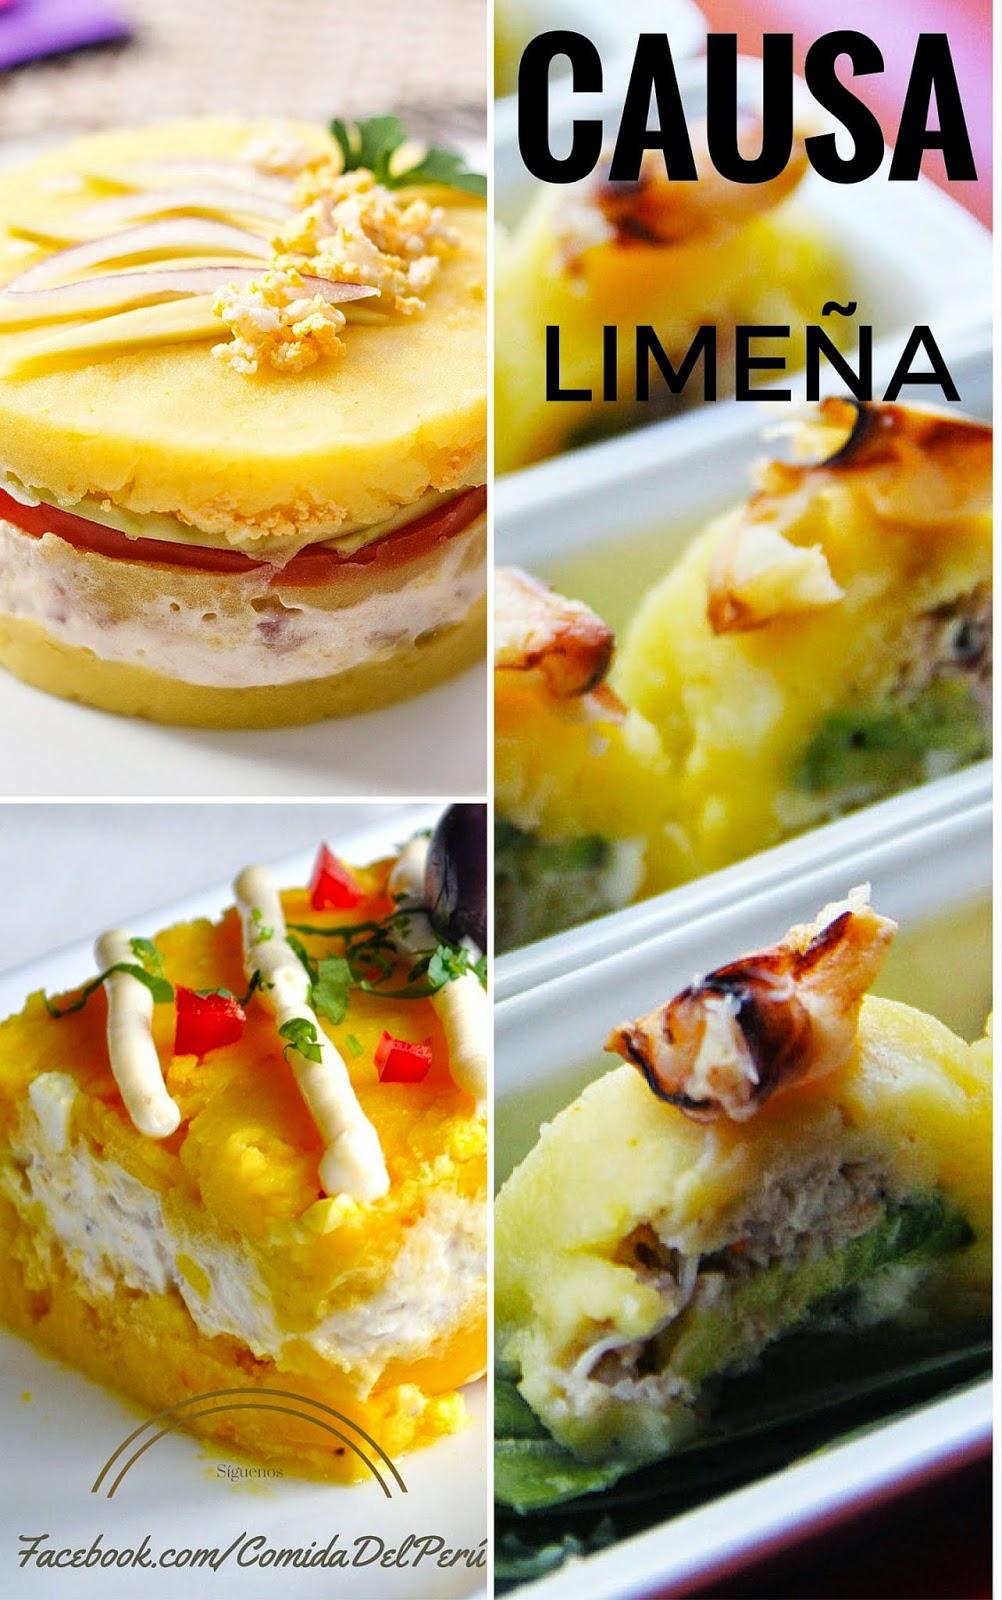 RECETA DE CAUSA LIMEÑA - Peruvian recipes